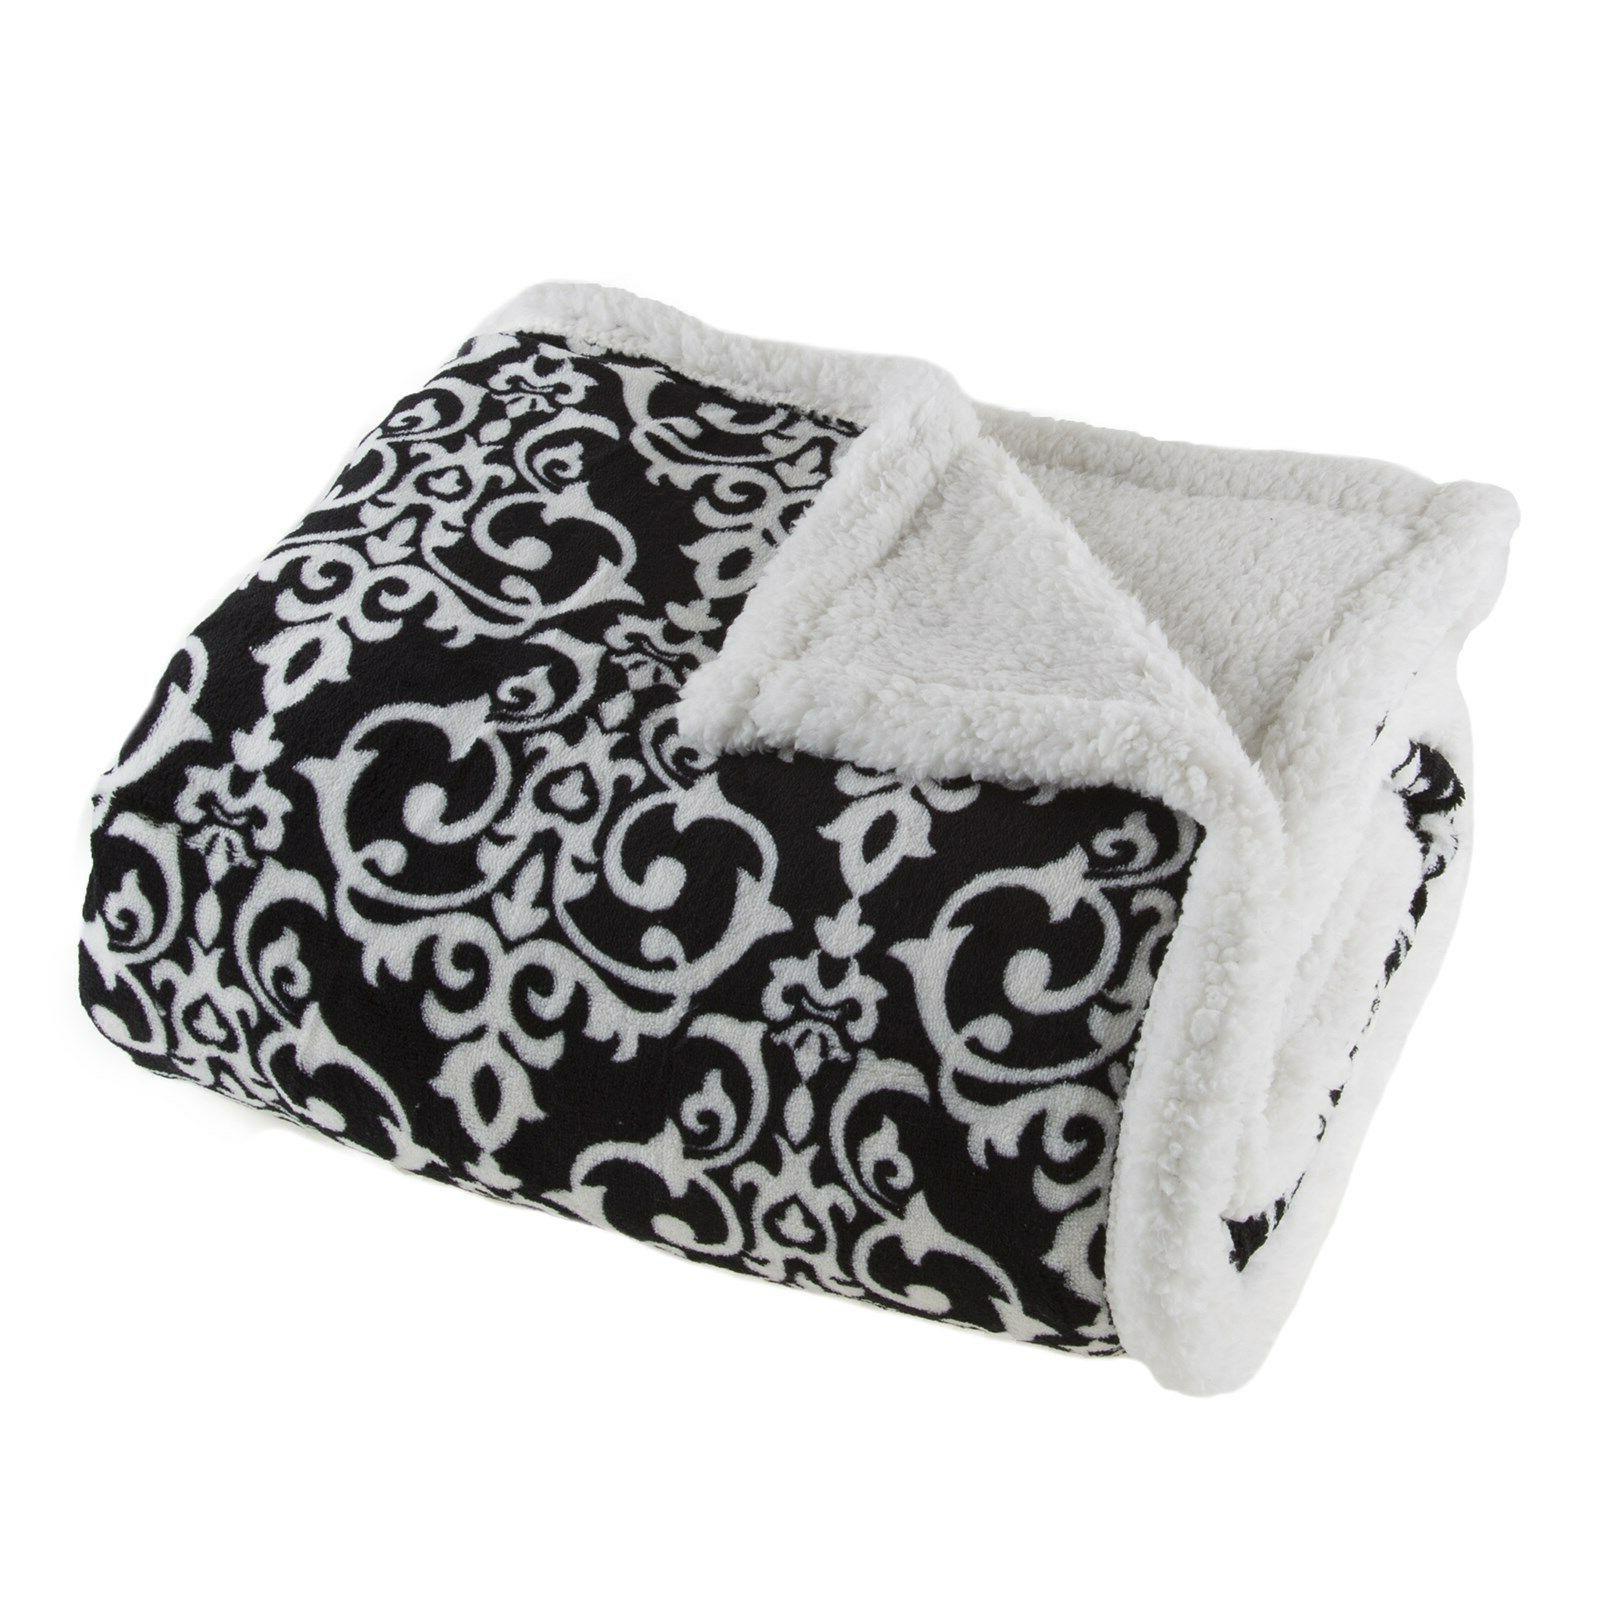 Lavish Home White and Black Throw 50 x